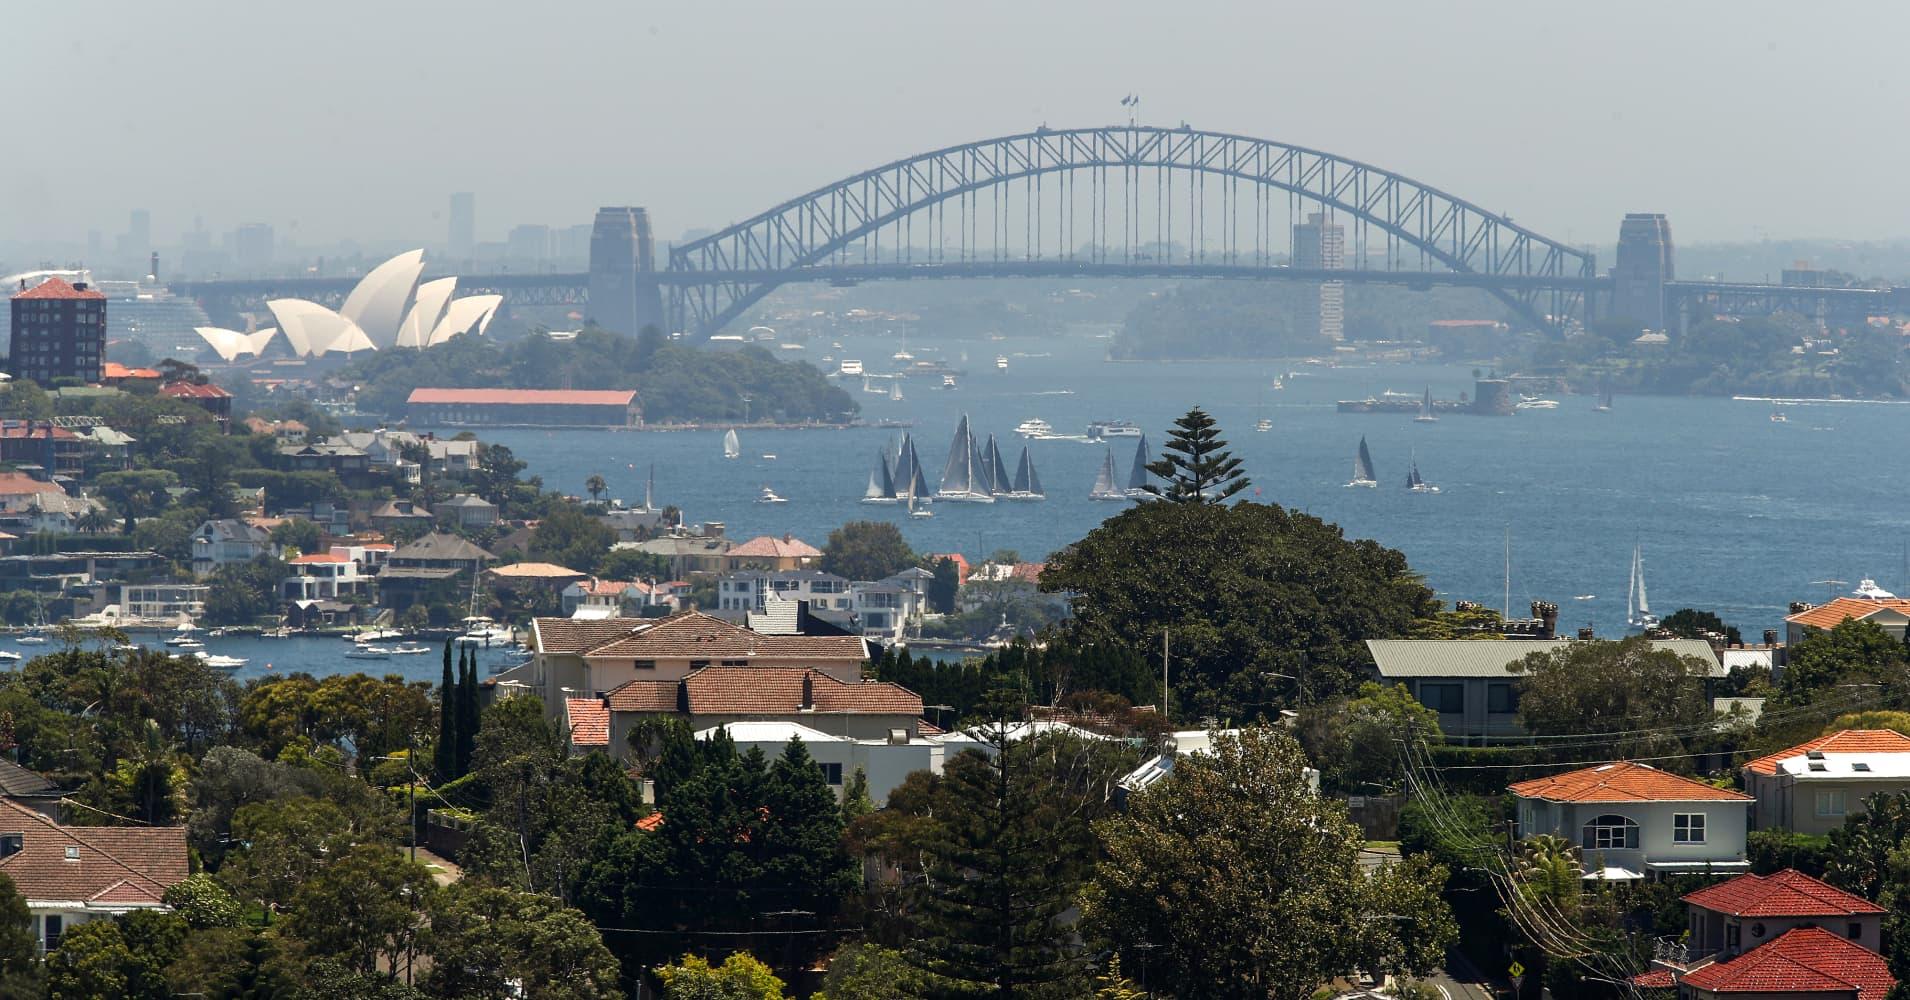 Australia dollar skids as the economy slows sharply